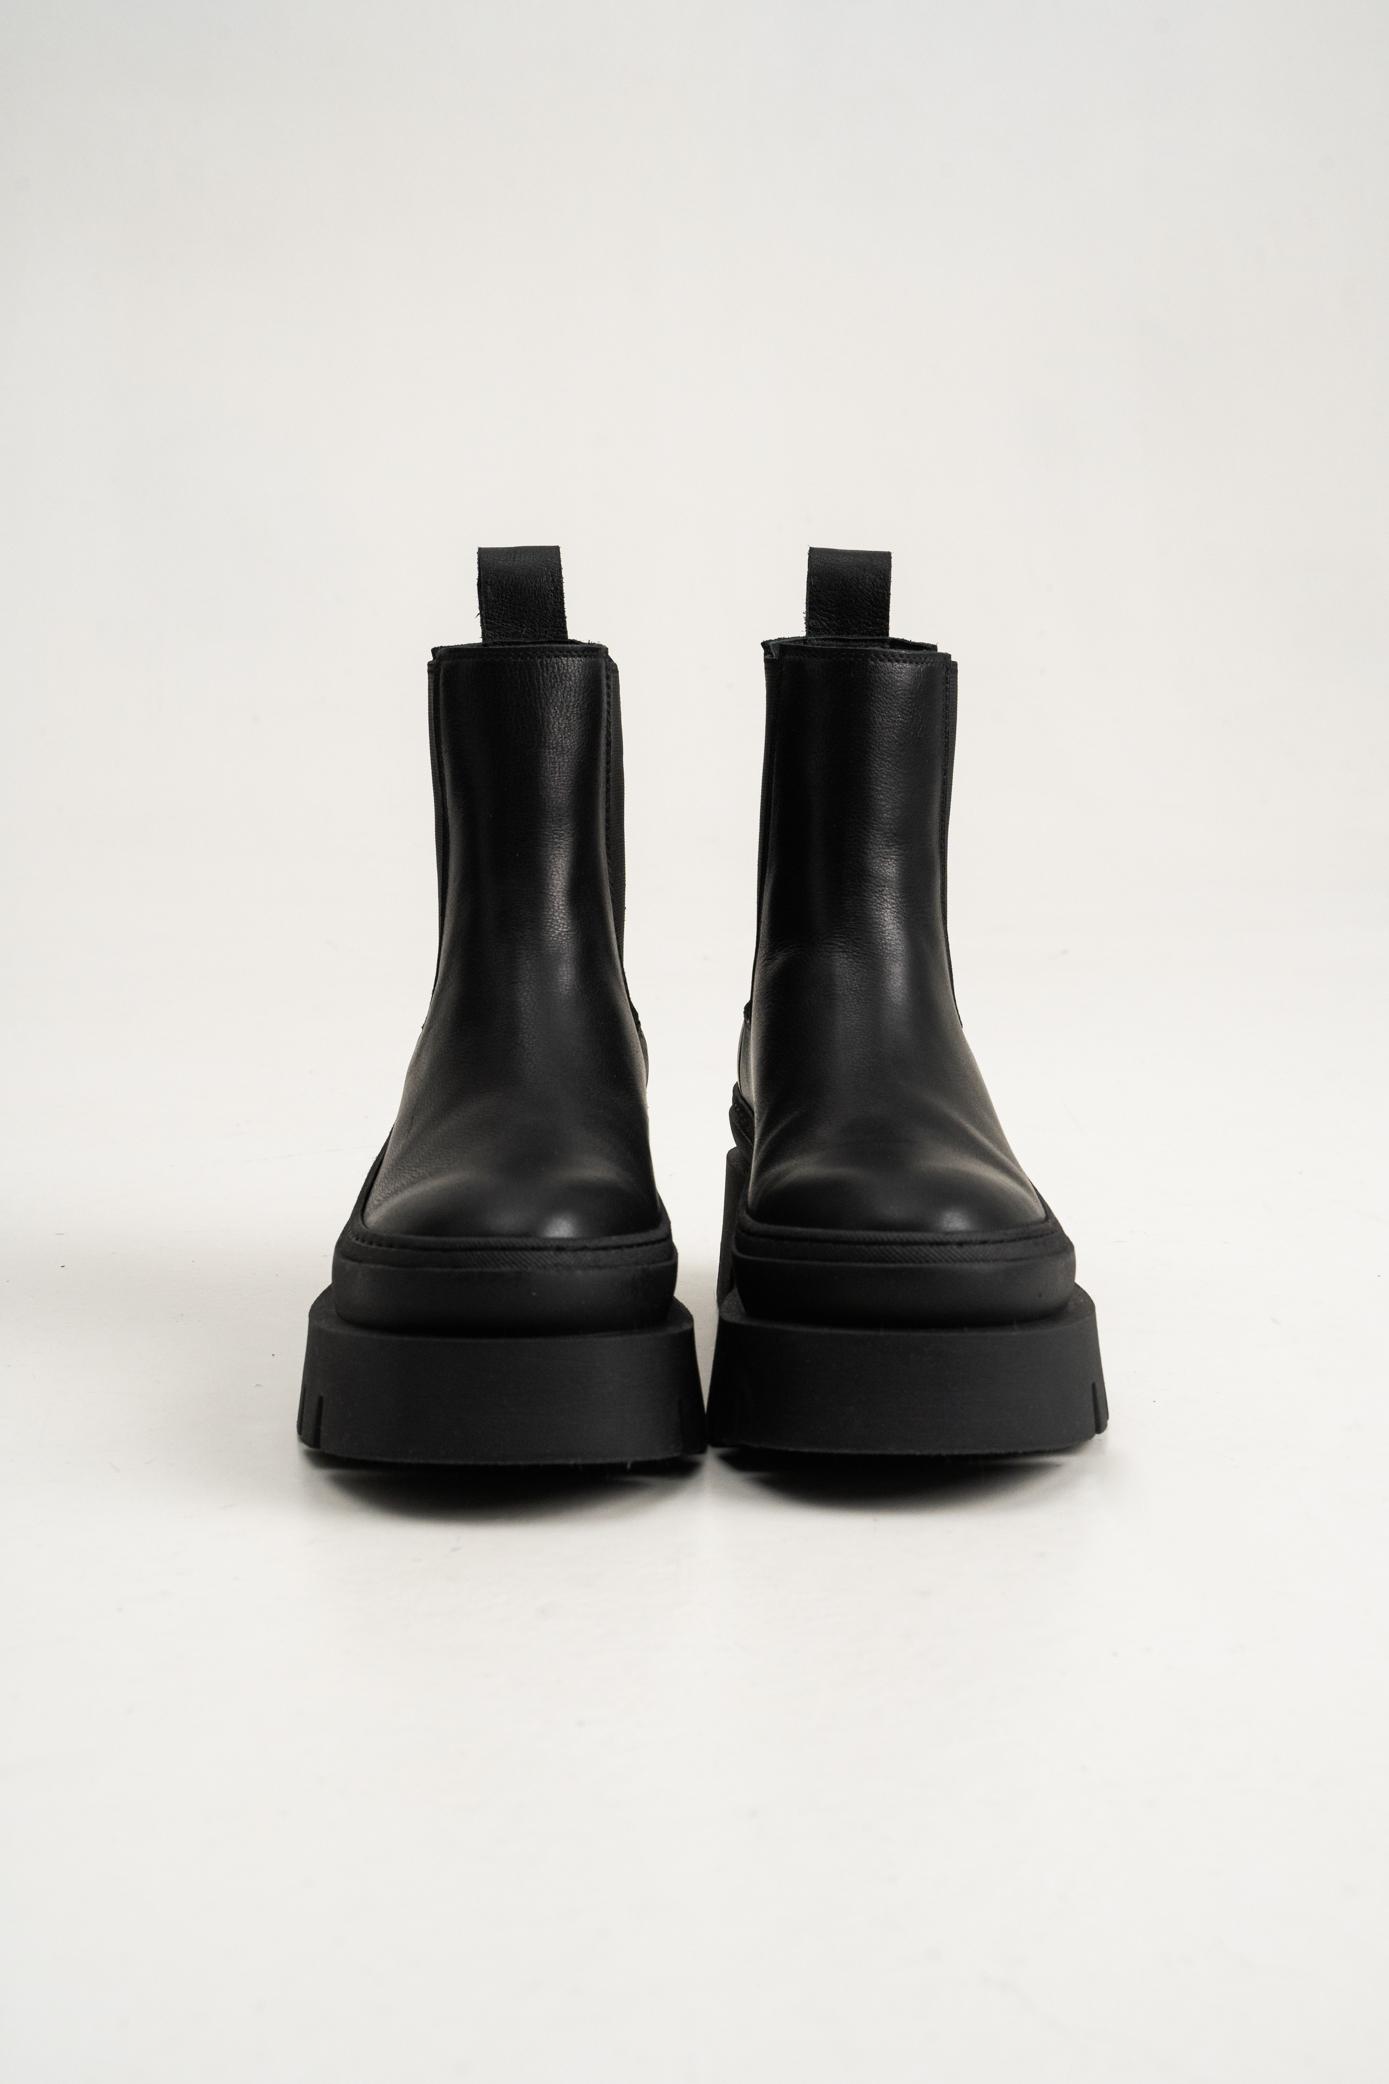 CPH686 vitello black/black - alternative 2